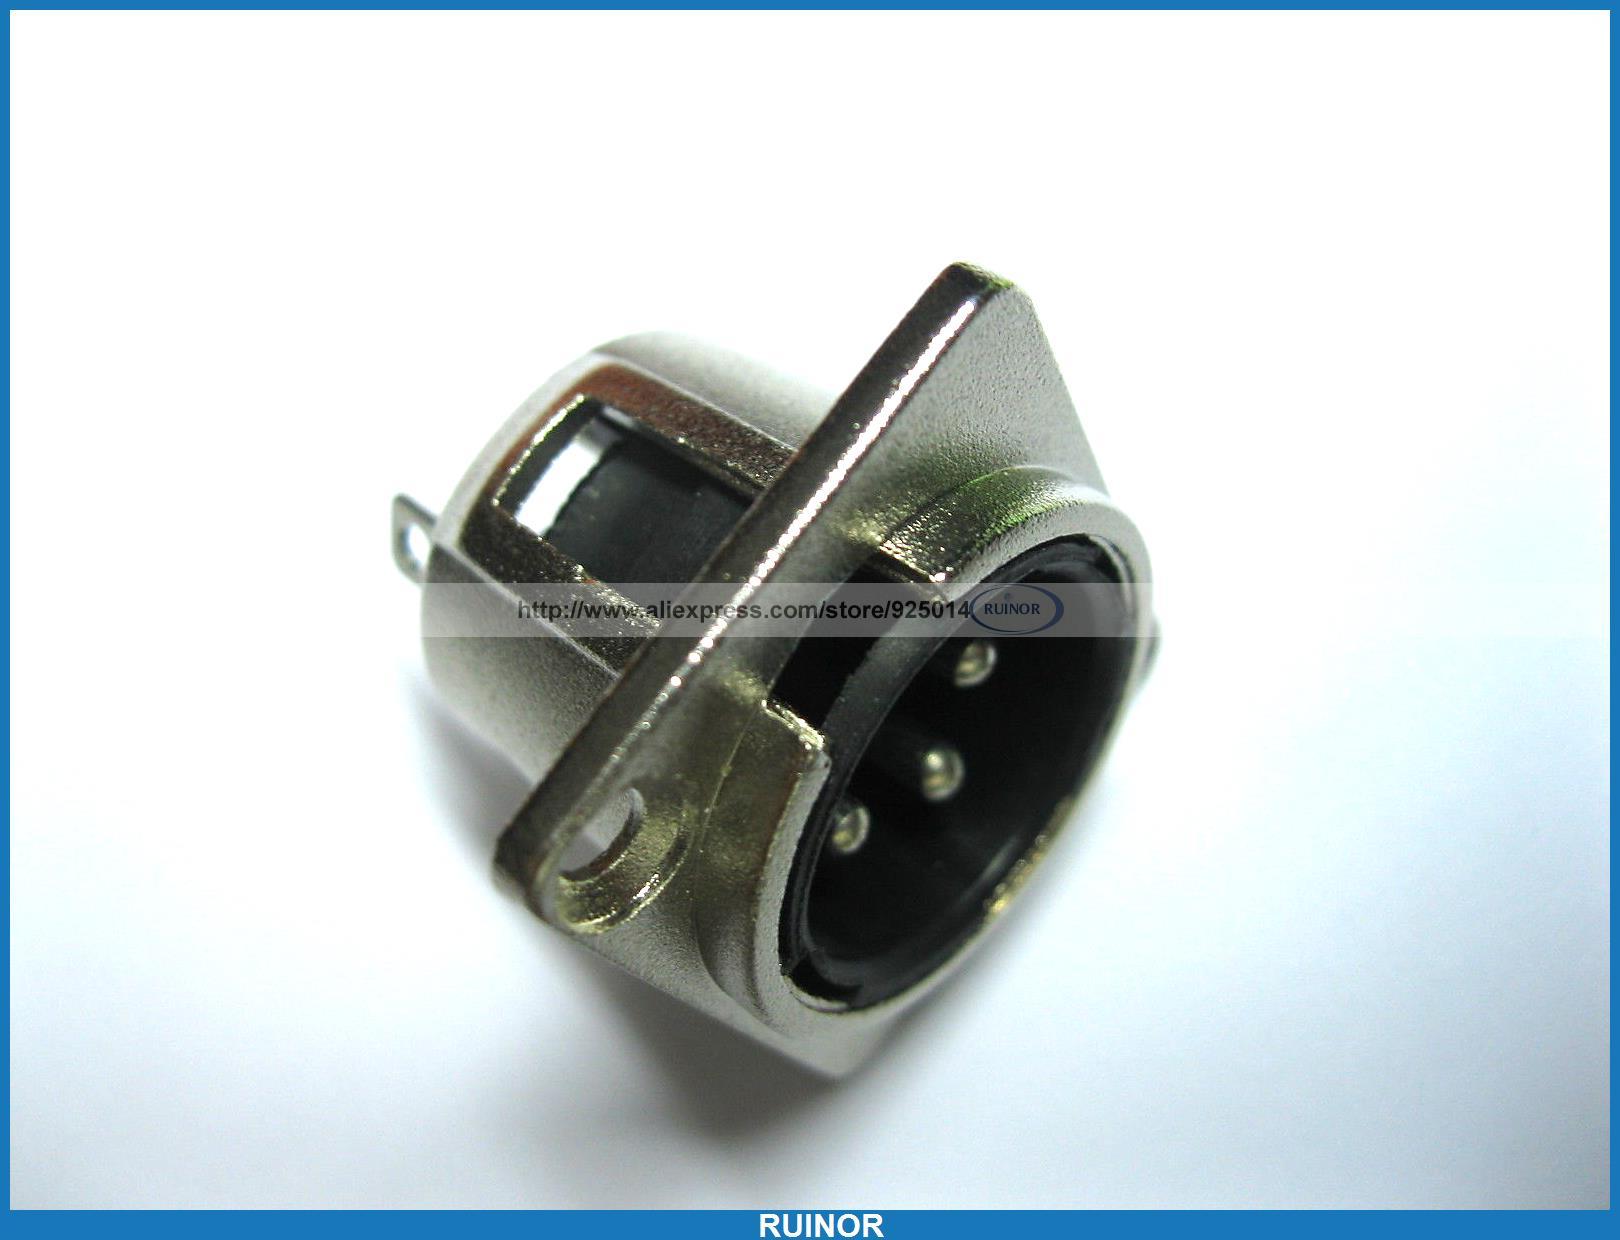 10 Pcs Metal Audio Mic Connector XLR 3 Pin Male Chassis Mount Socket Locking(China (Mainland))